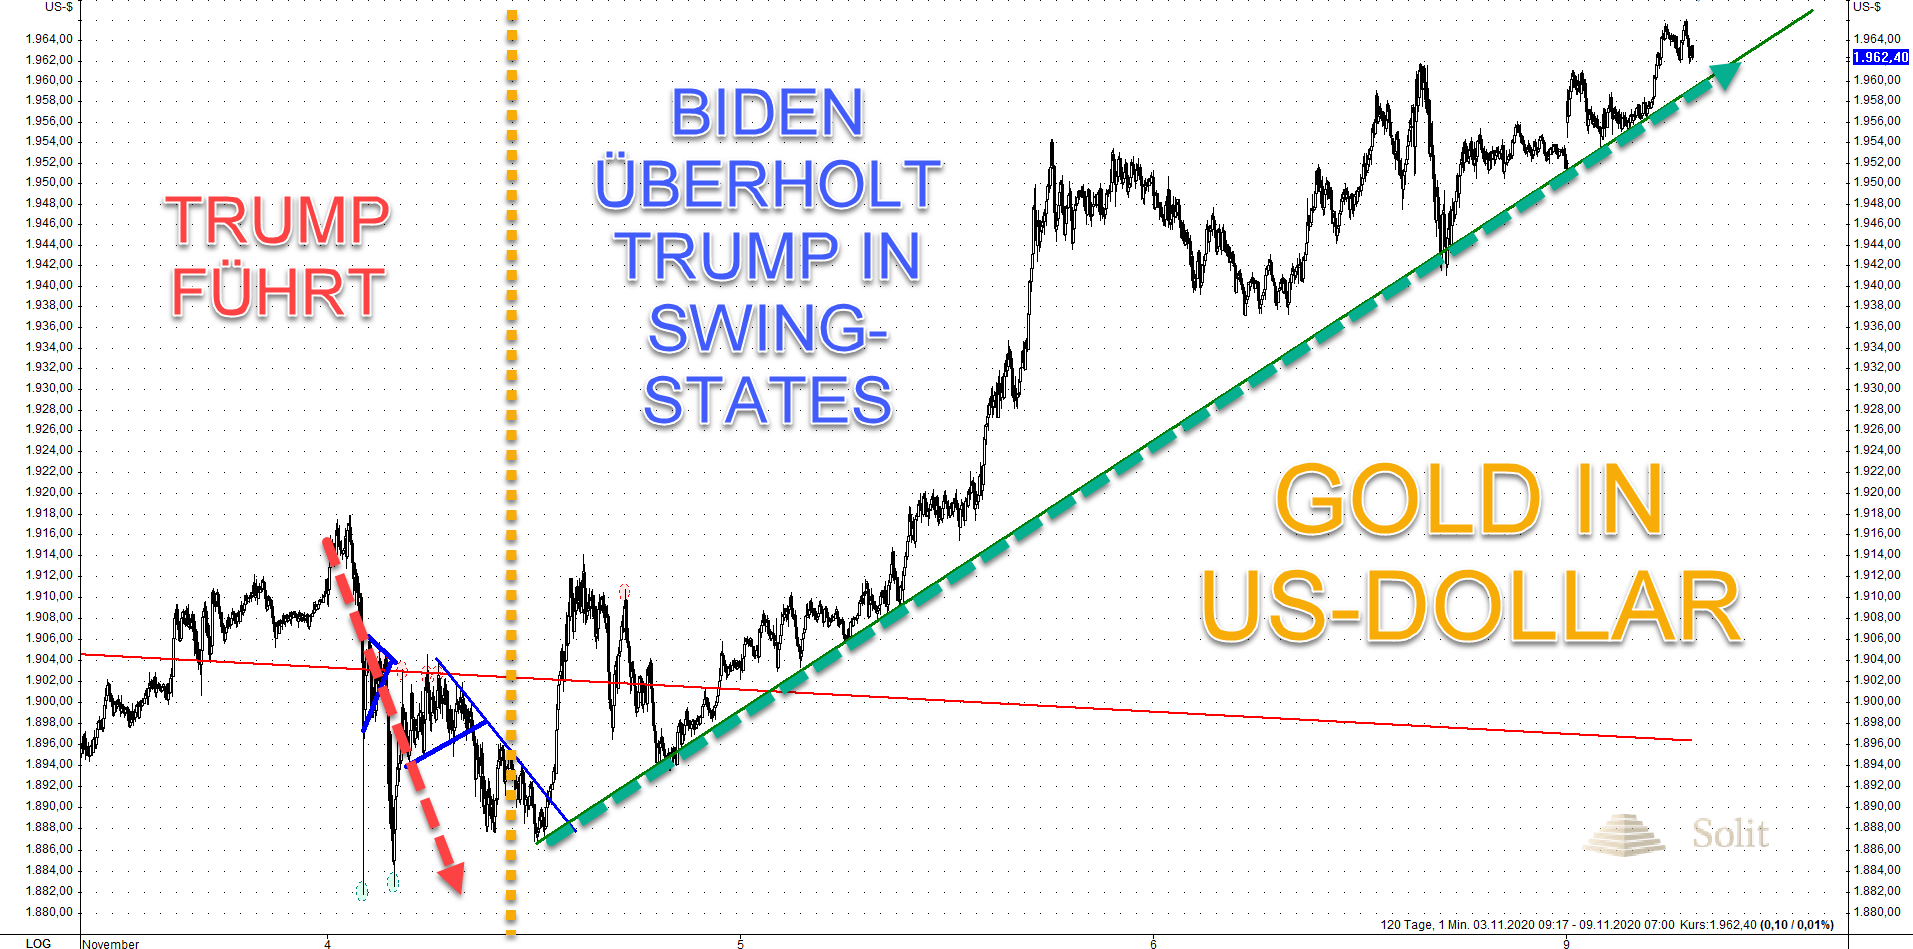 Gold in US-Dollar 09.11.2020